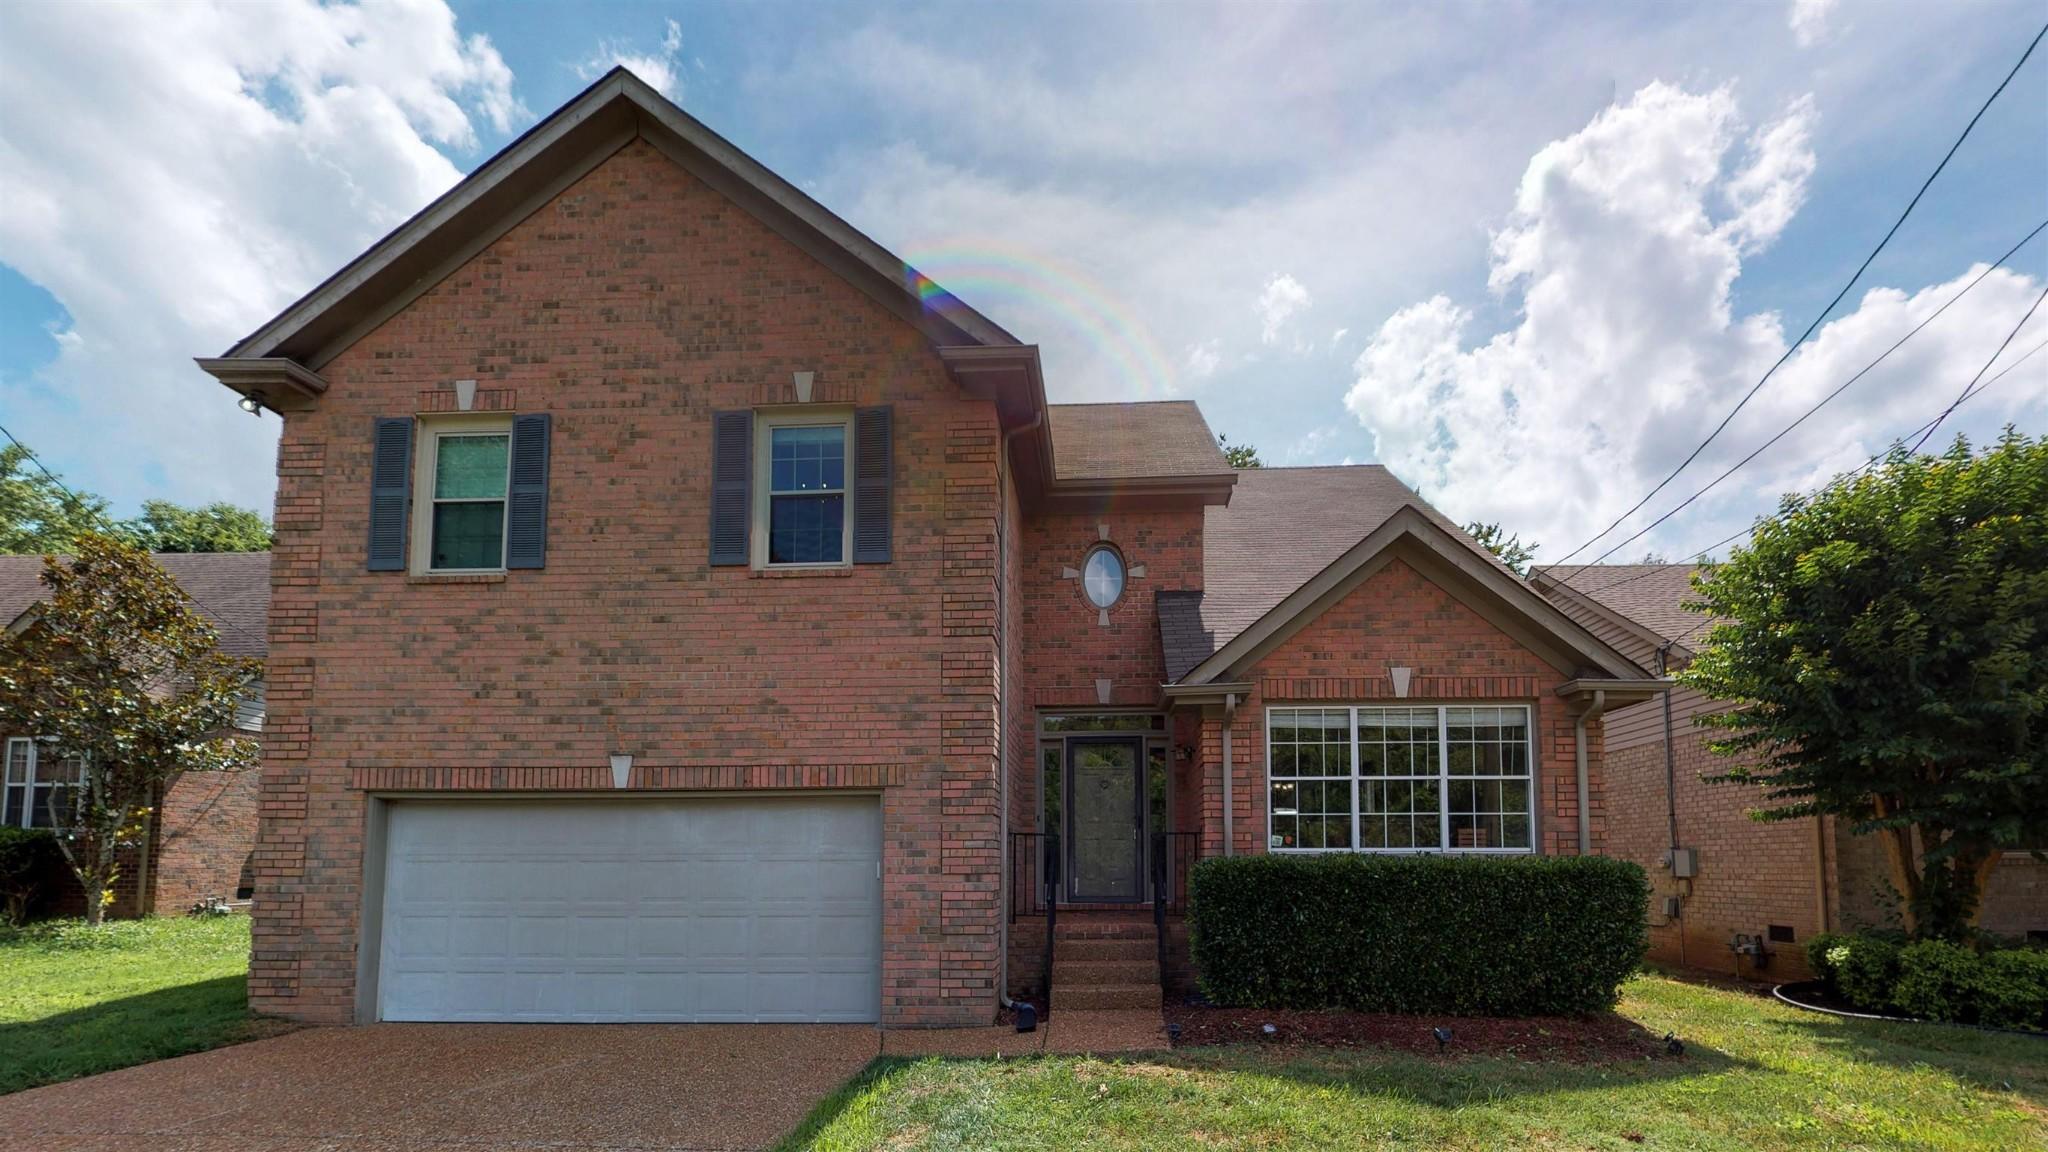 664 Williamsport Ct, Bellevue in Davidson County, TN County, TN 37221 Home for Sale